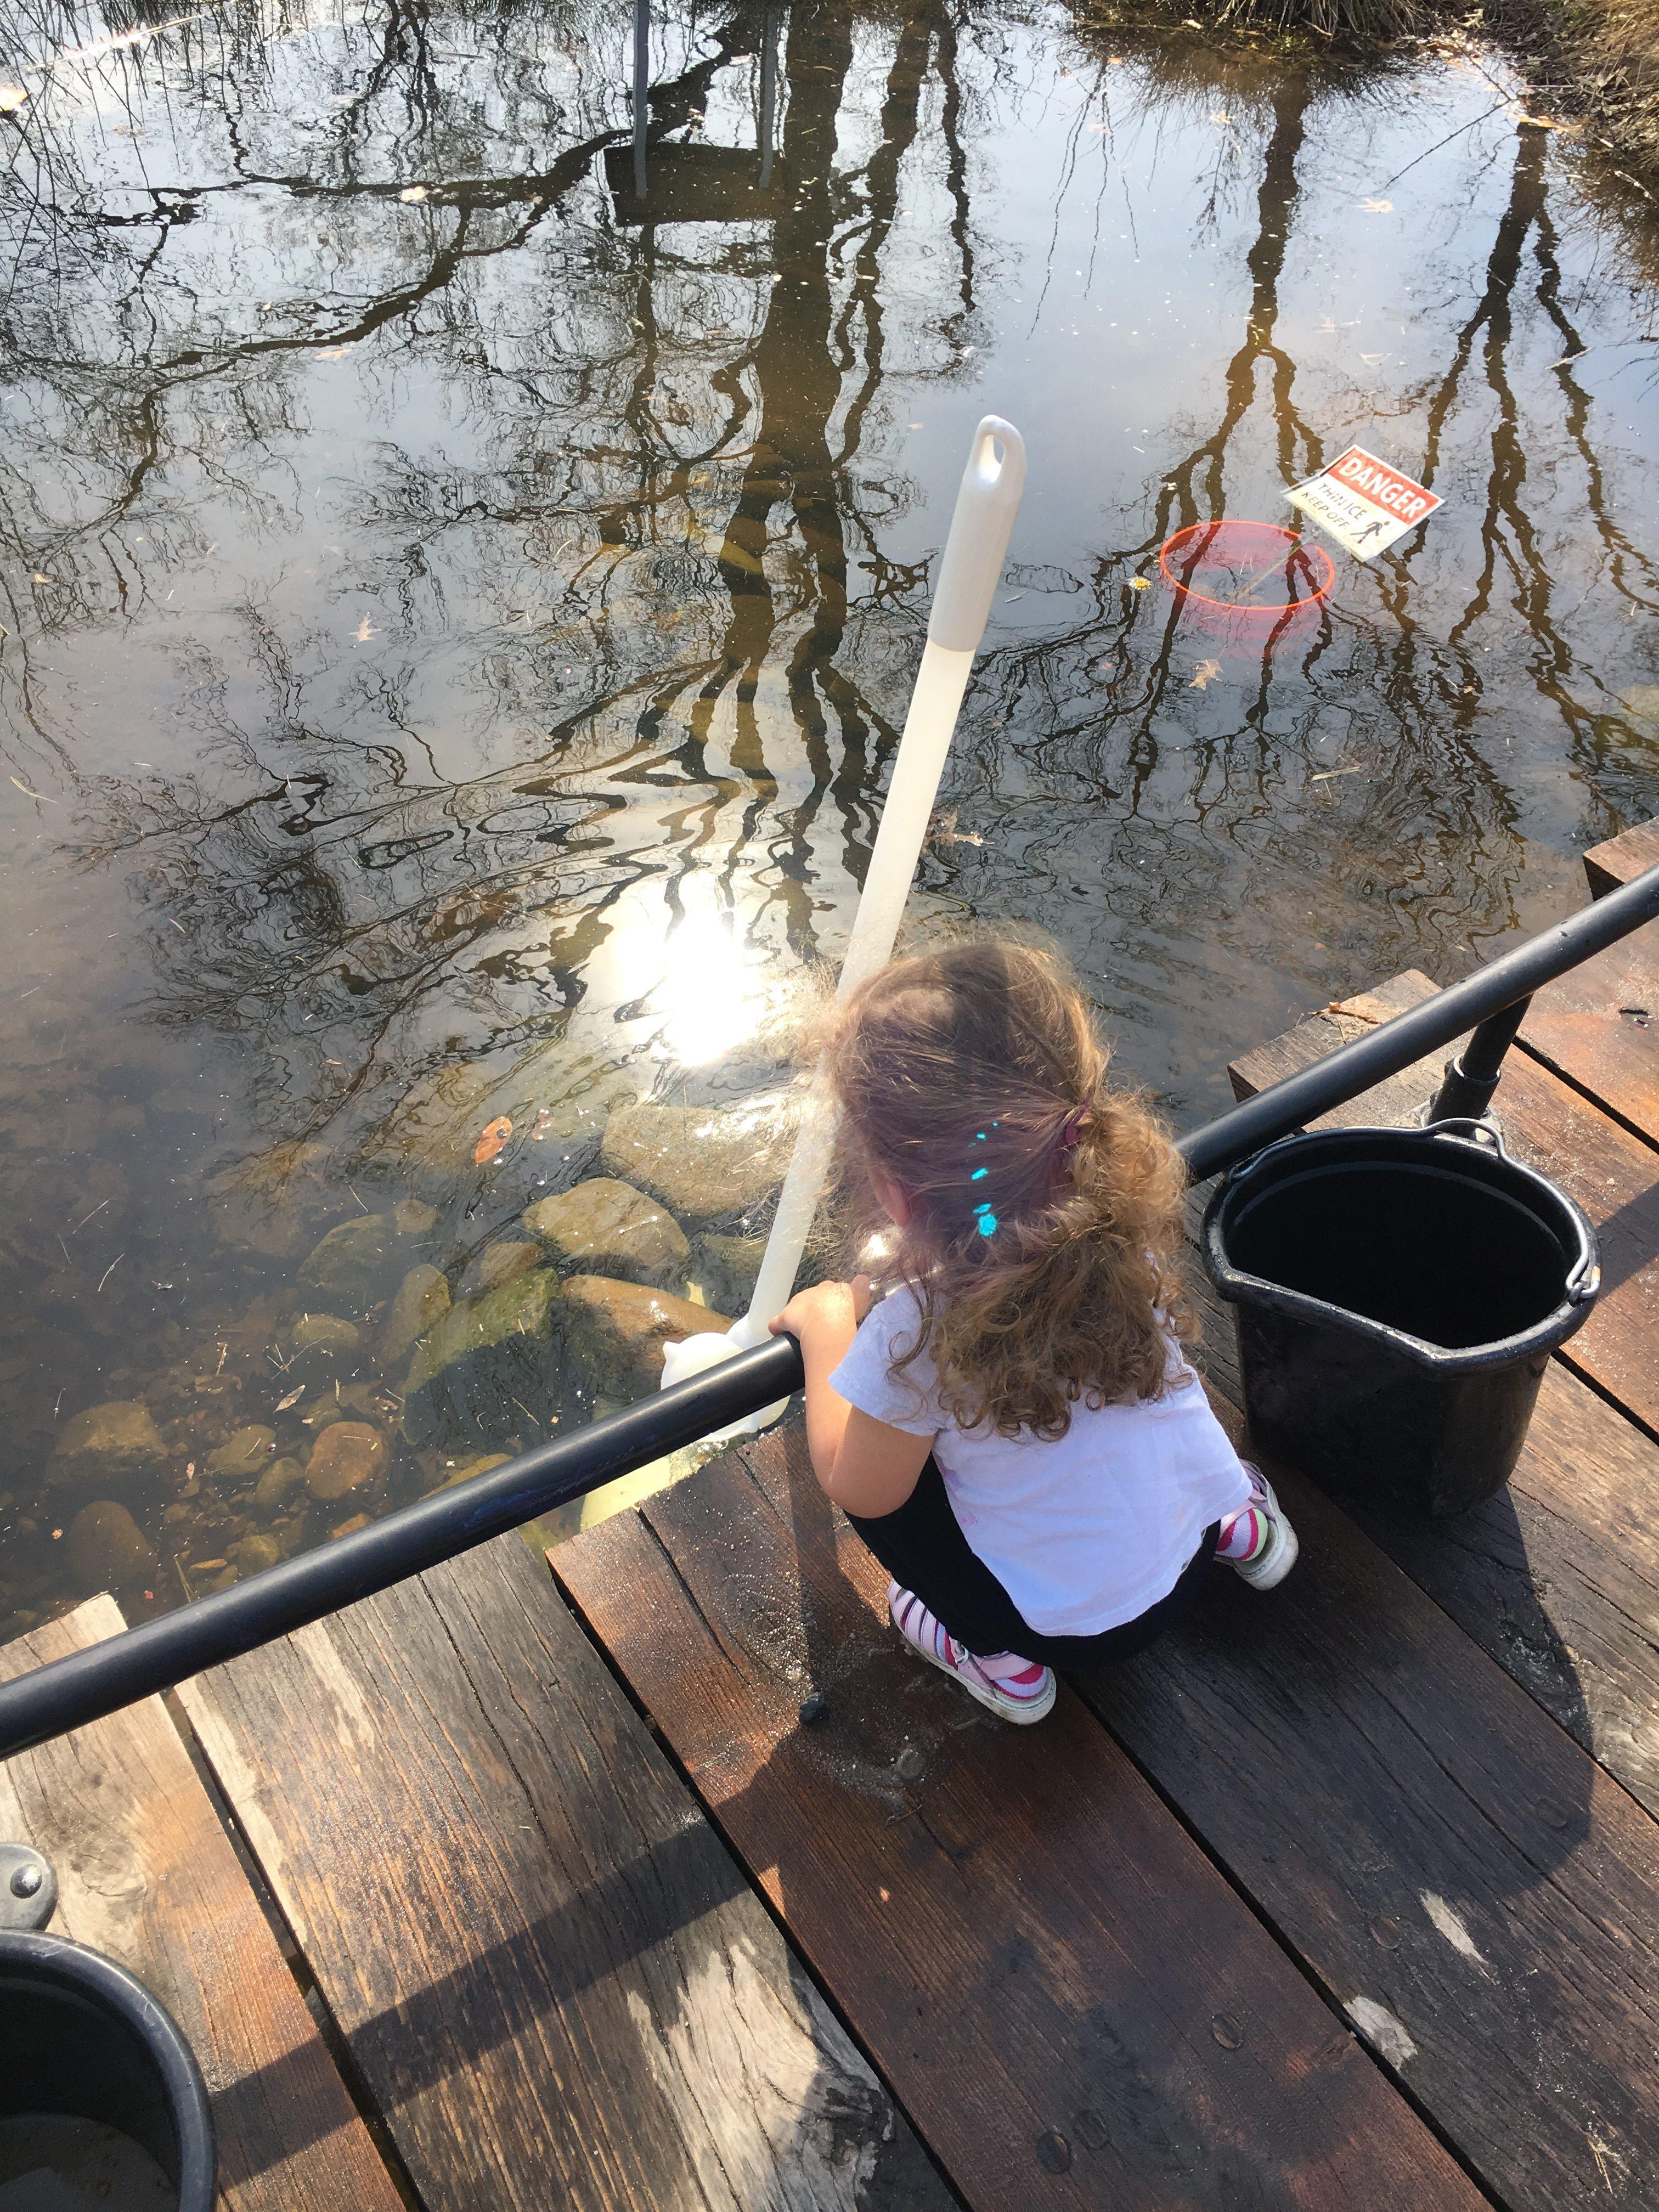 water play at brooklyn botanic garden